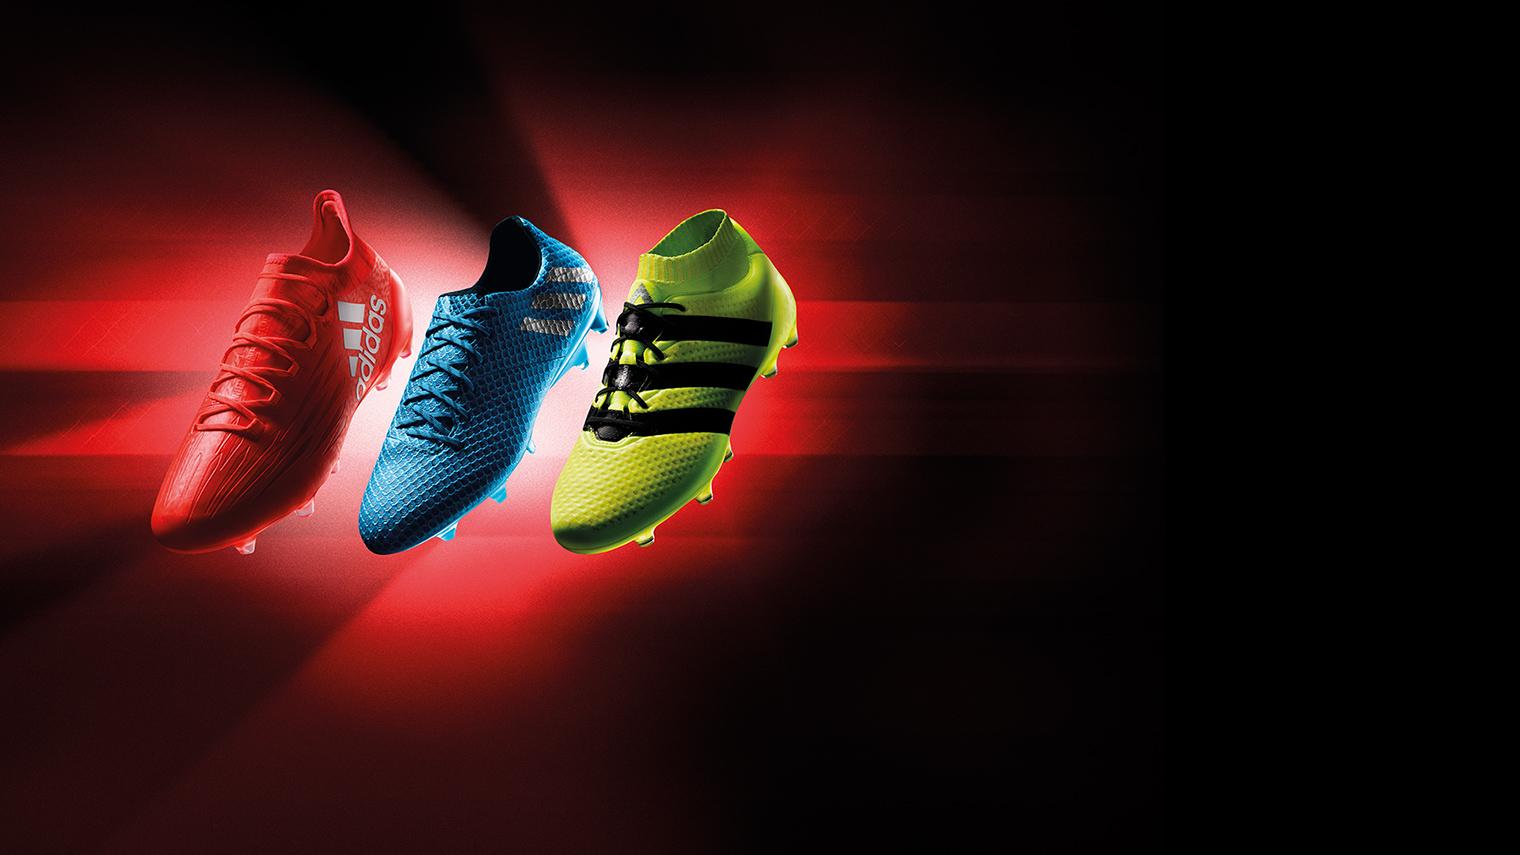 Noua colecție de ghete de fotbal Speed of light!